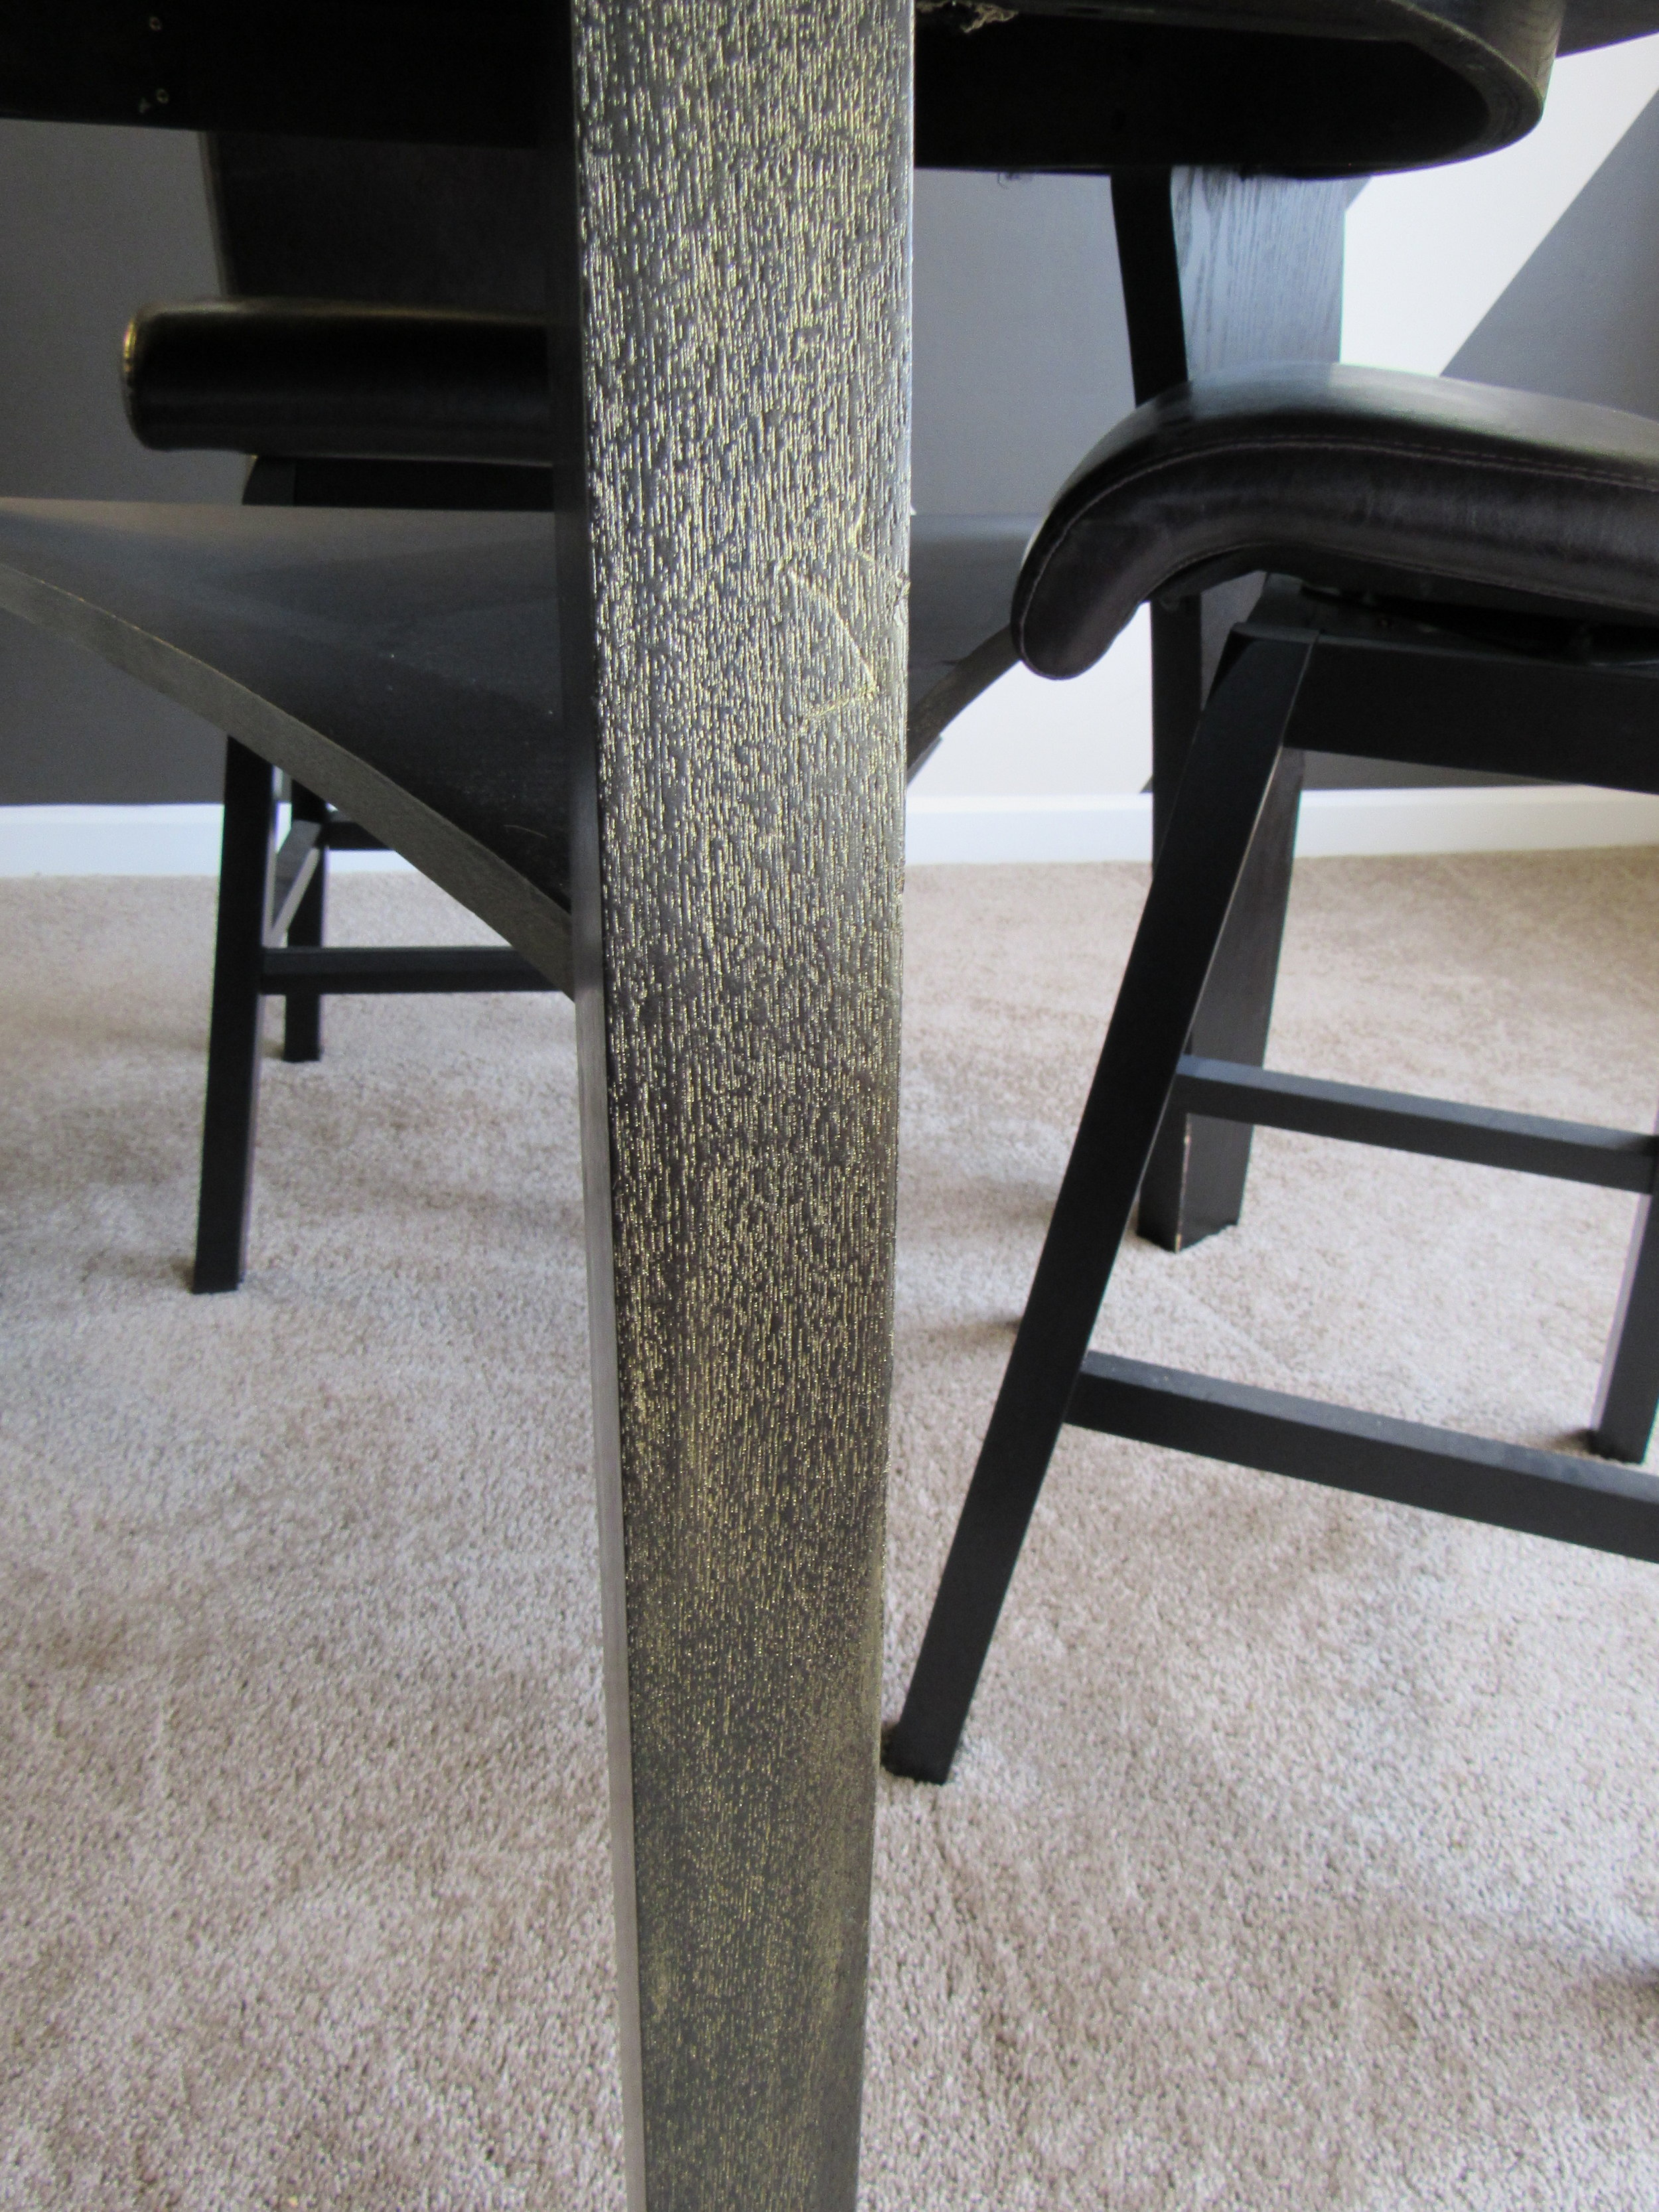 Table Leg 2.JPG